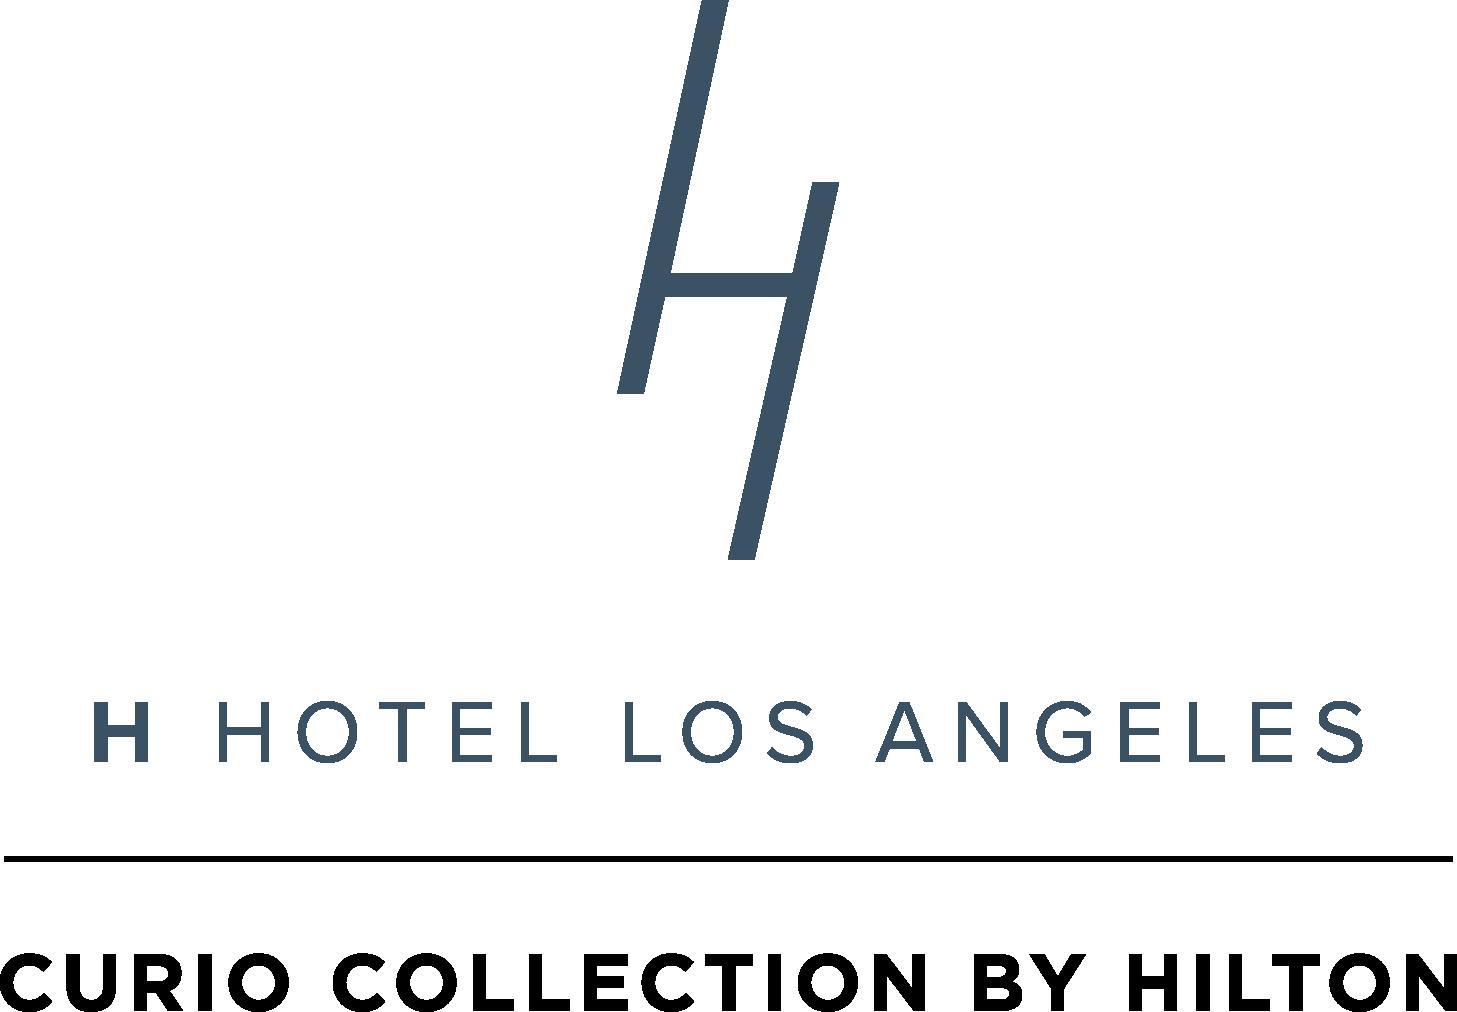 H Hotel Los Angeles, Curio Collection by Hilton logo